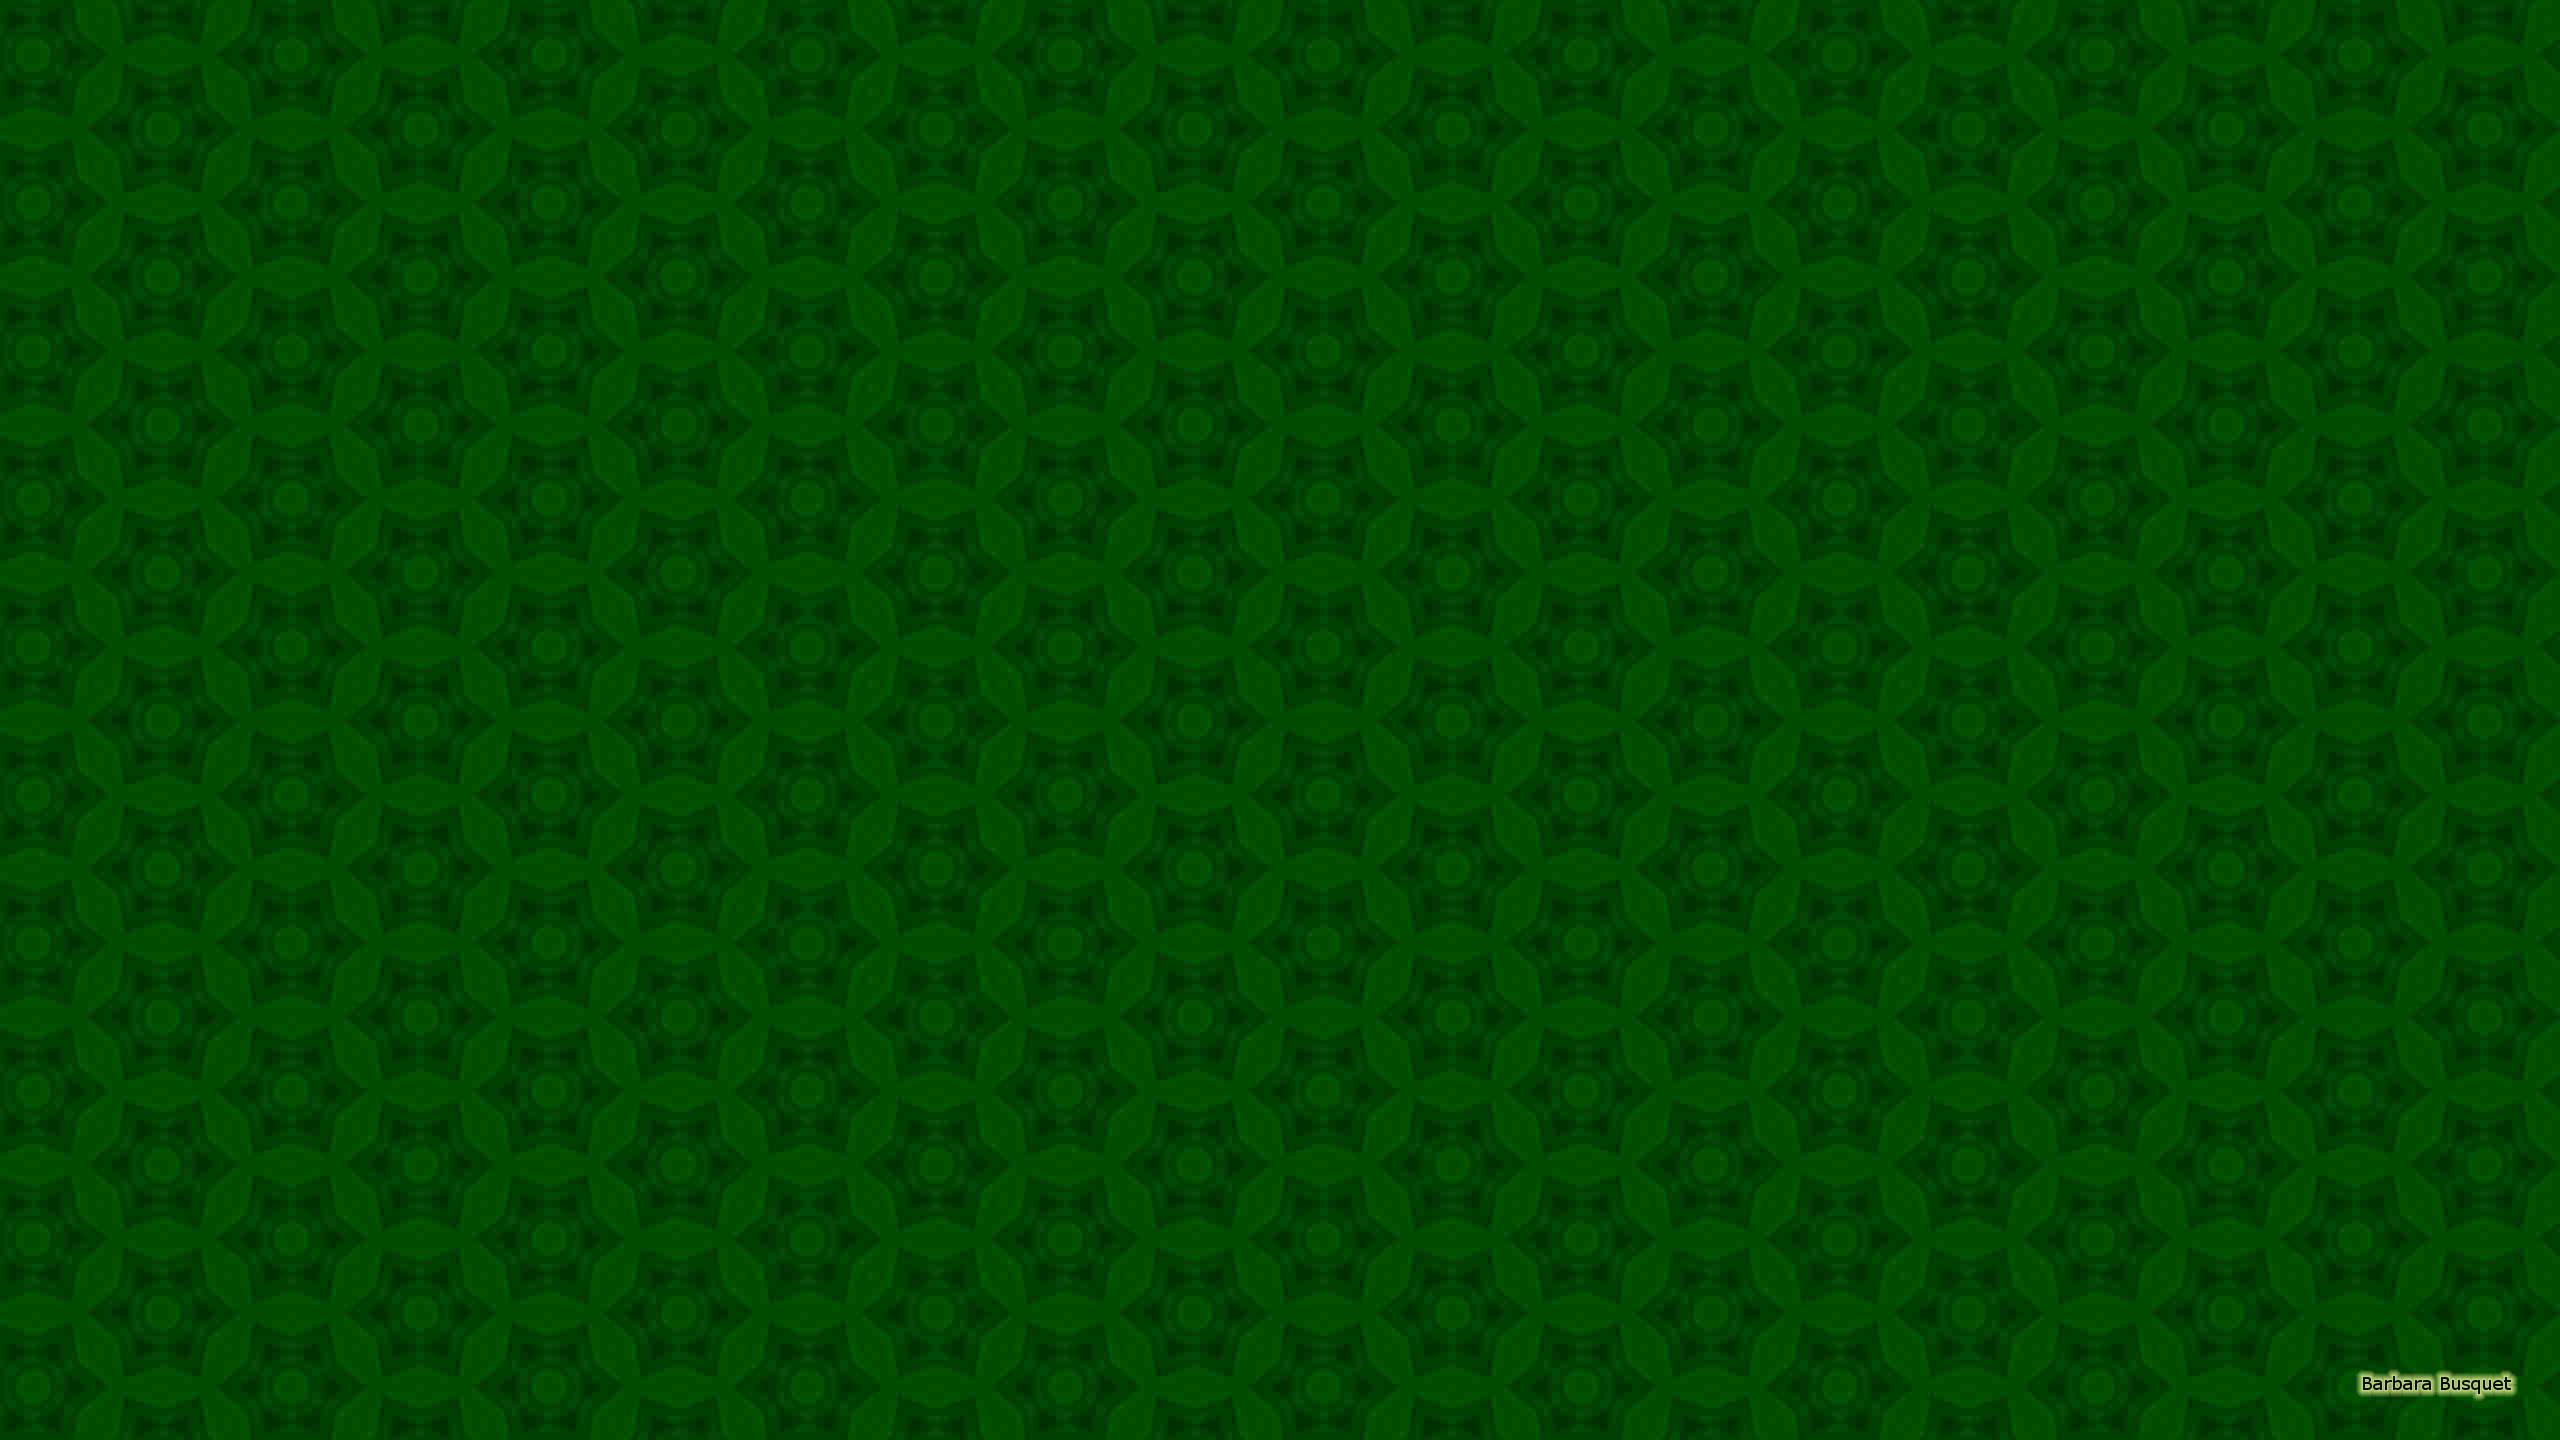 Dark Green Wallpaper Hd: Barbaras HD Wallpapers